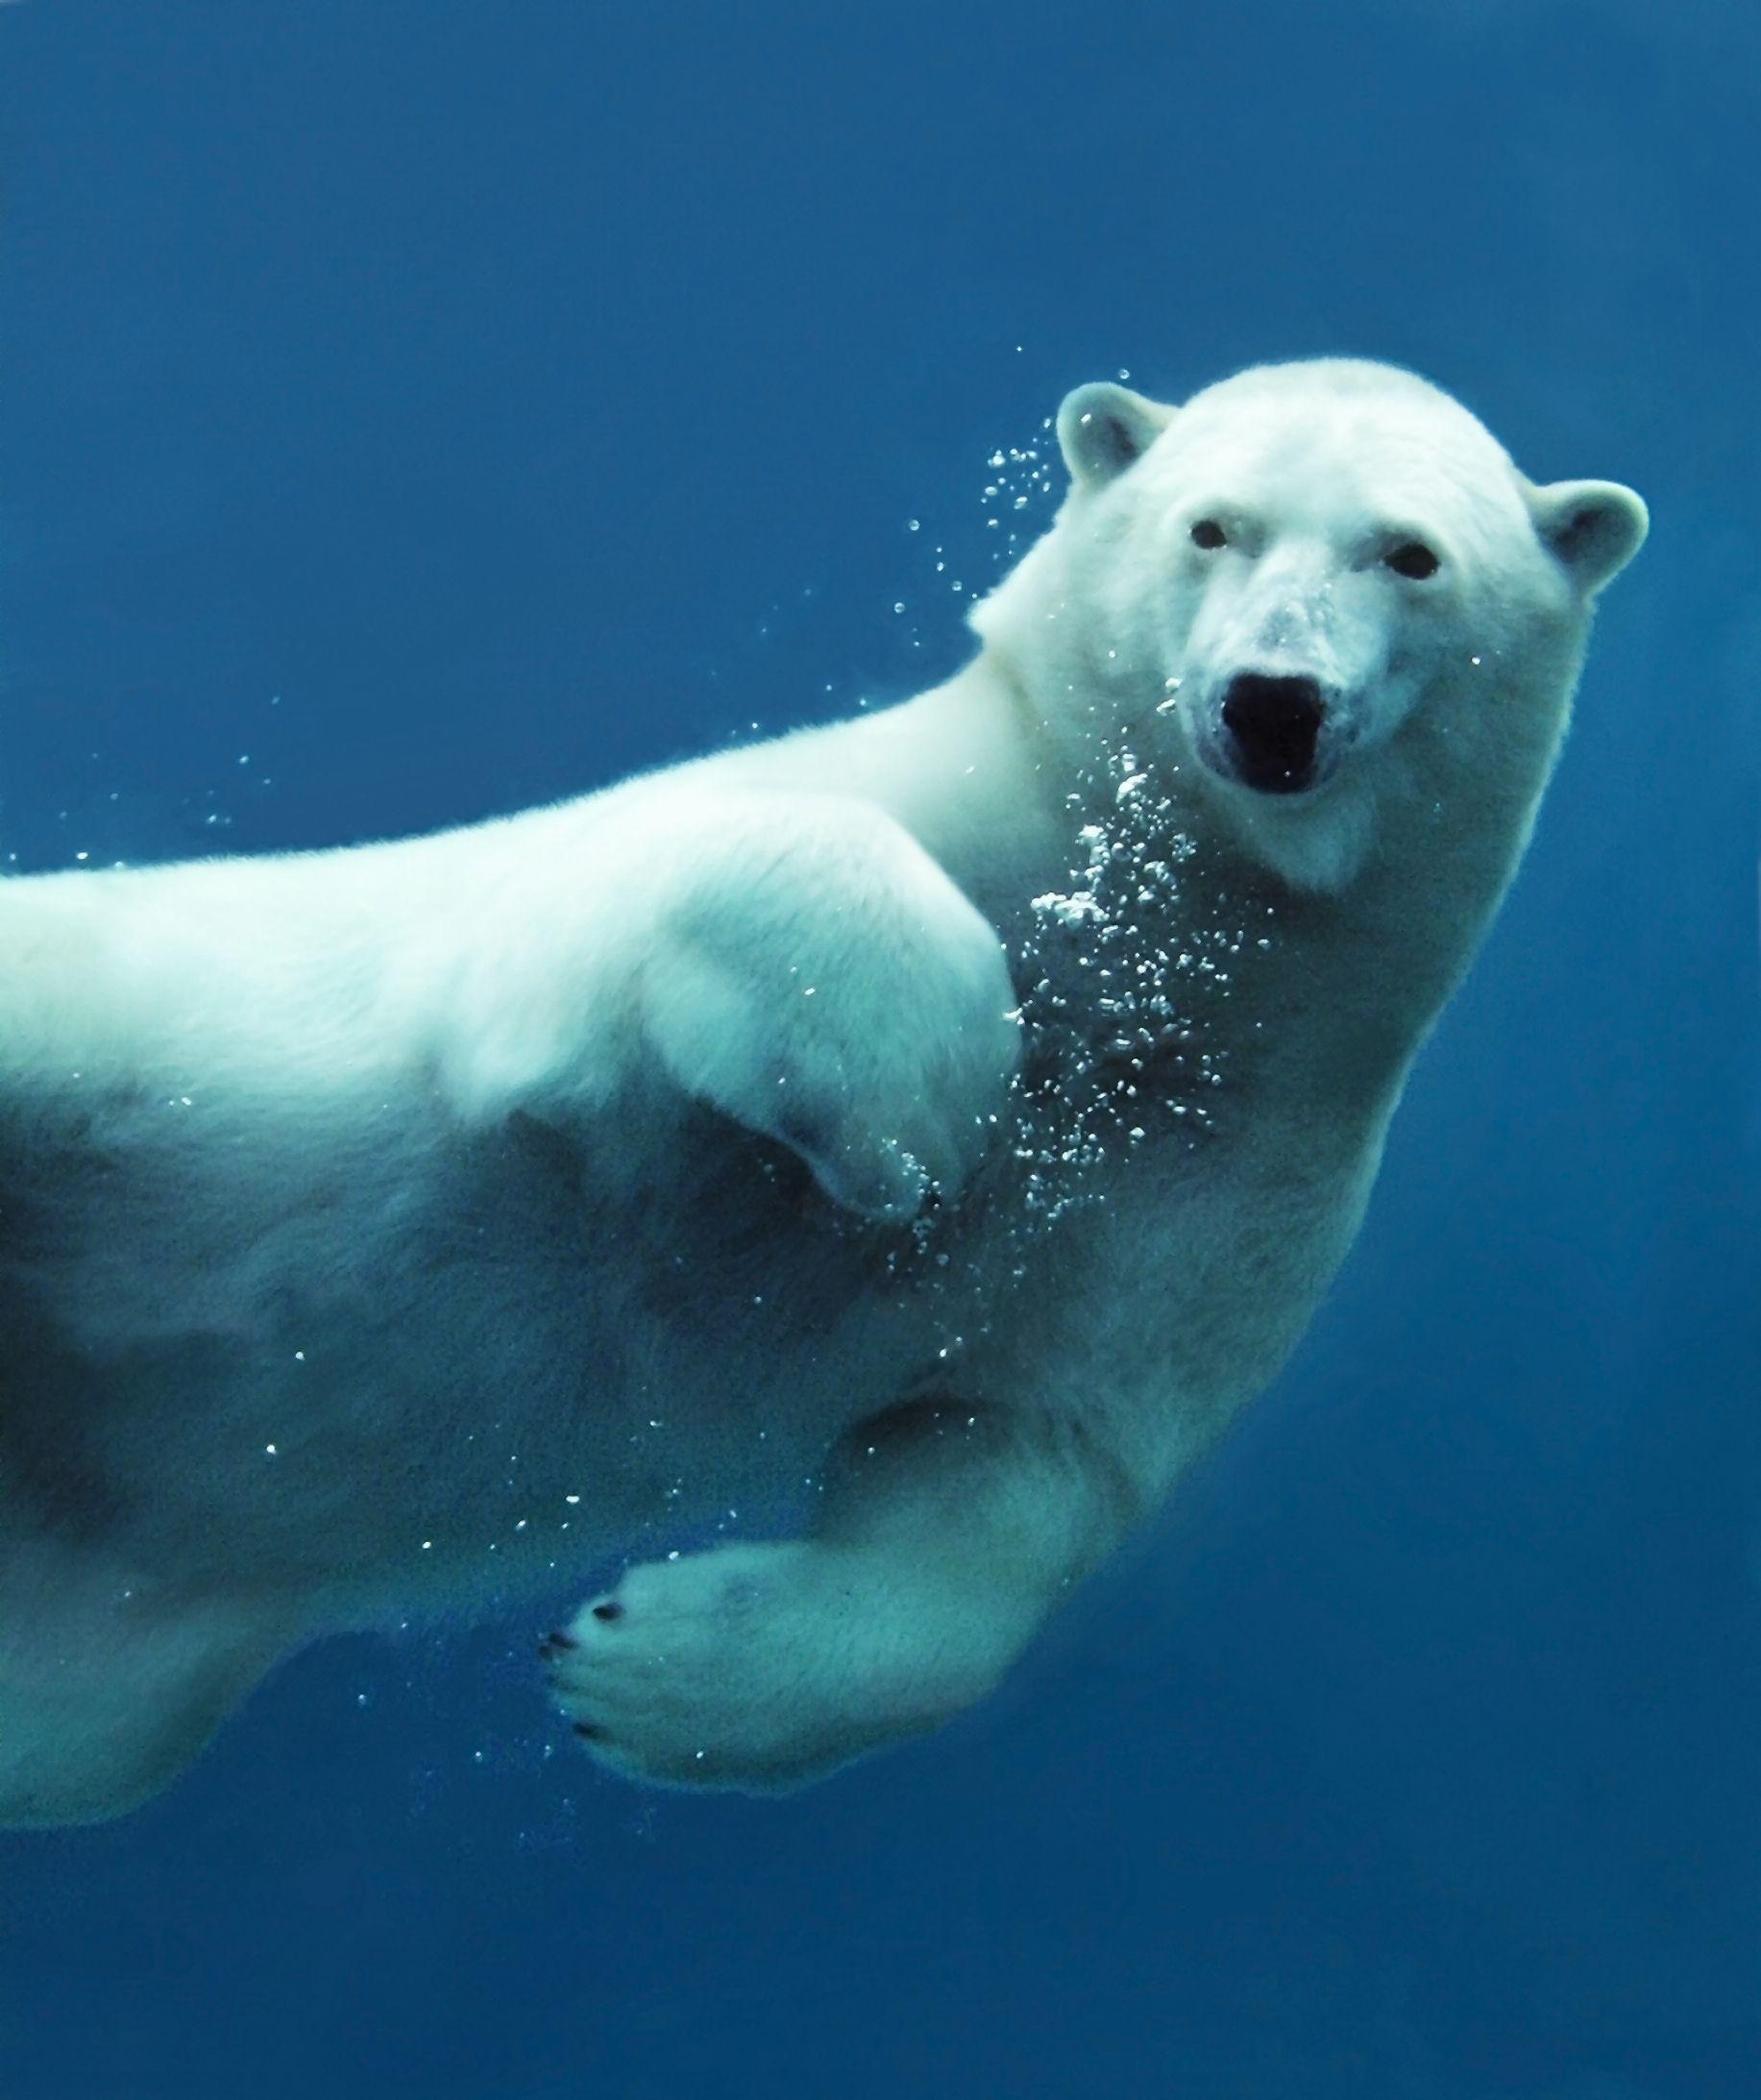 Swimming bear clipart png freeuse stock белый медведь плывет фото: 12 тыс изображений найдено в ... png freeuse stock